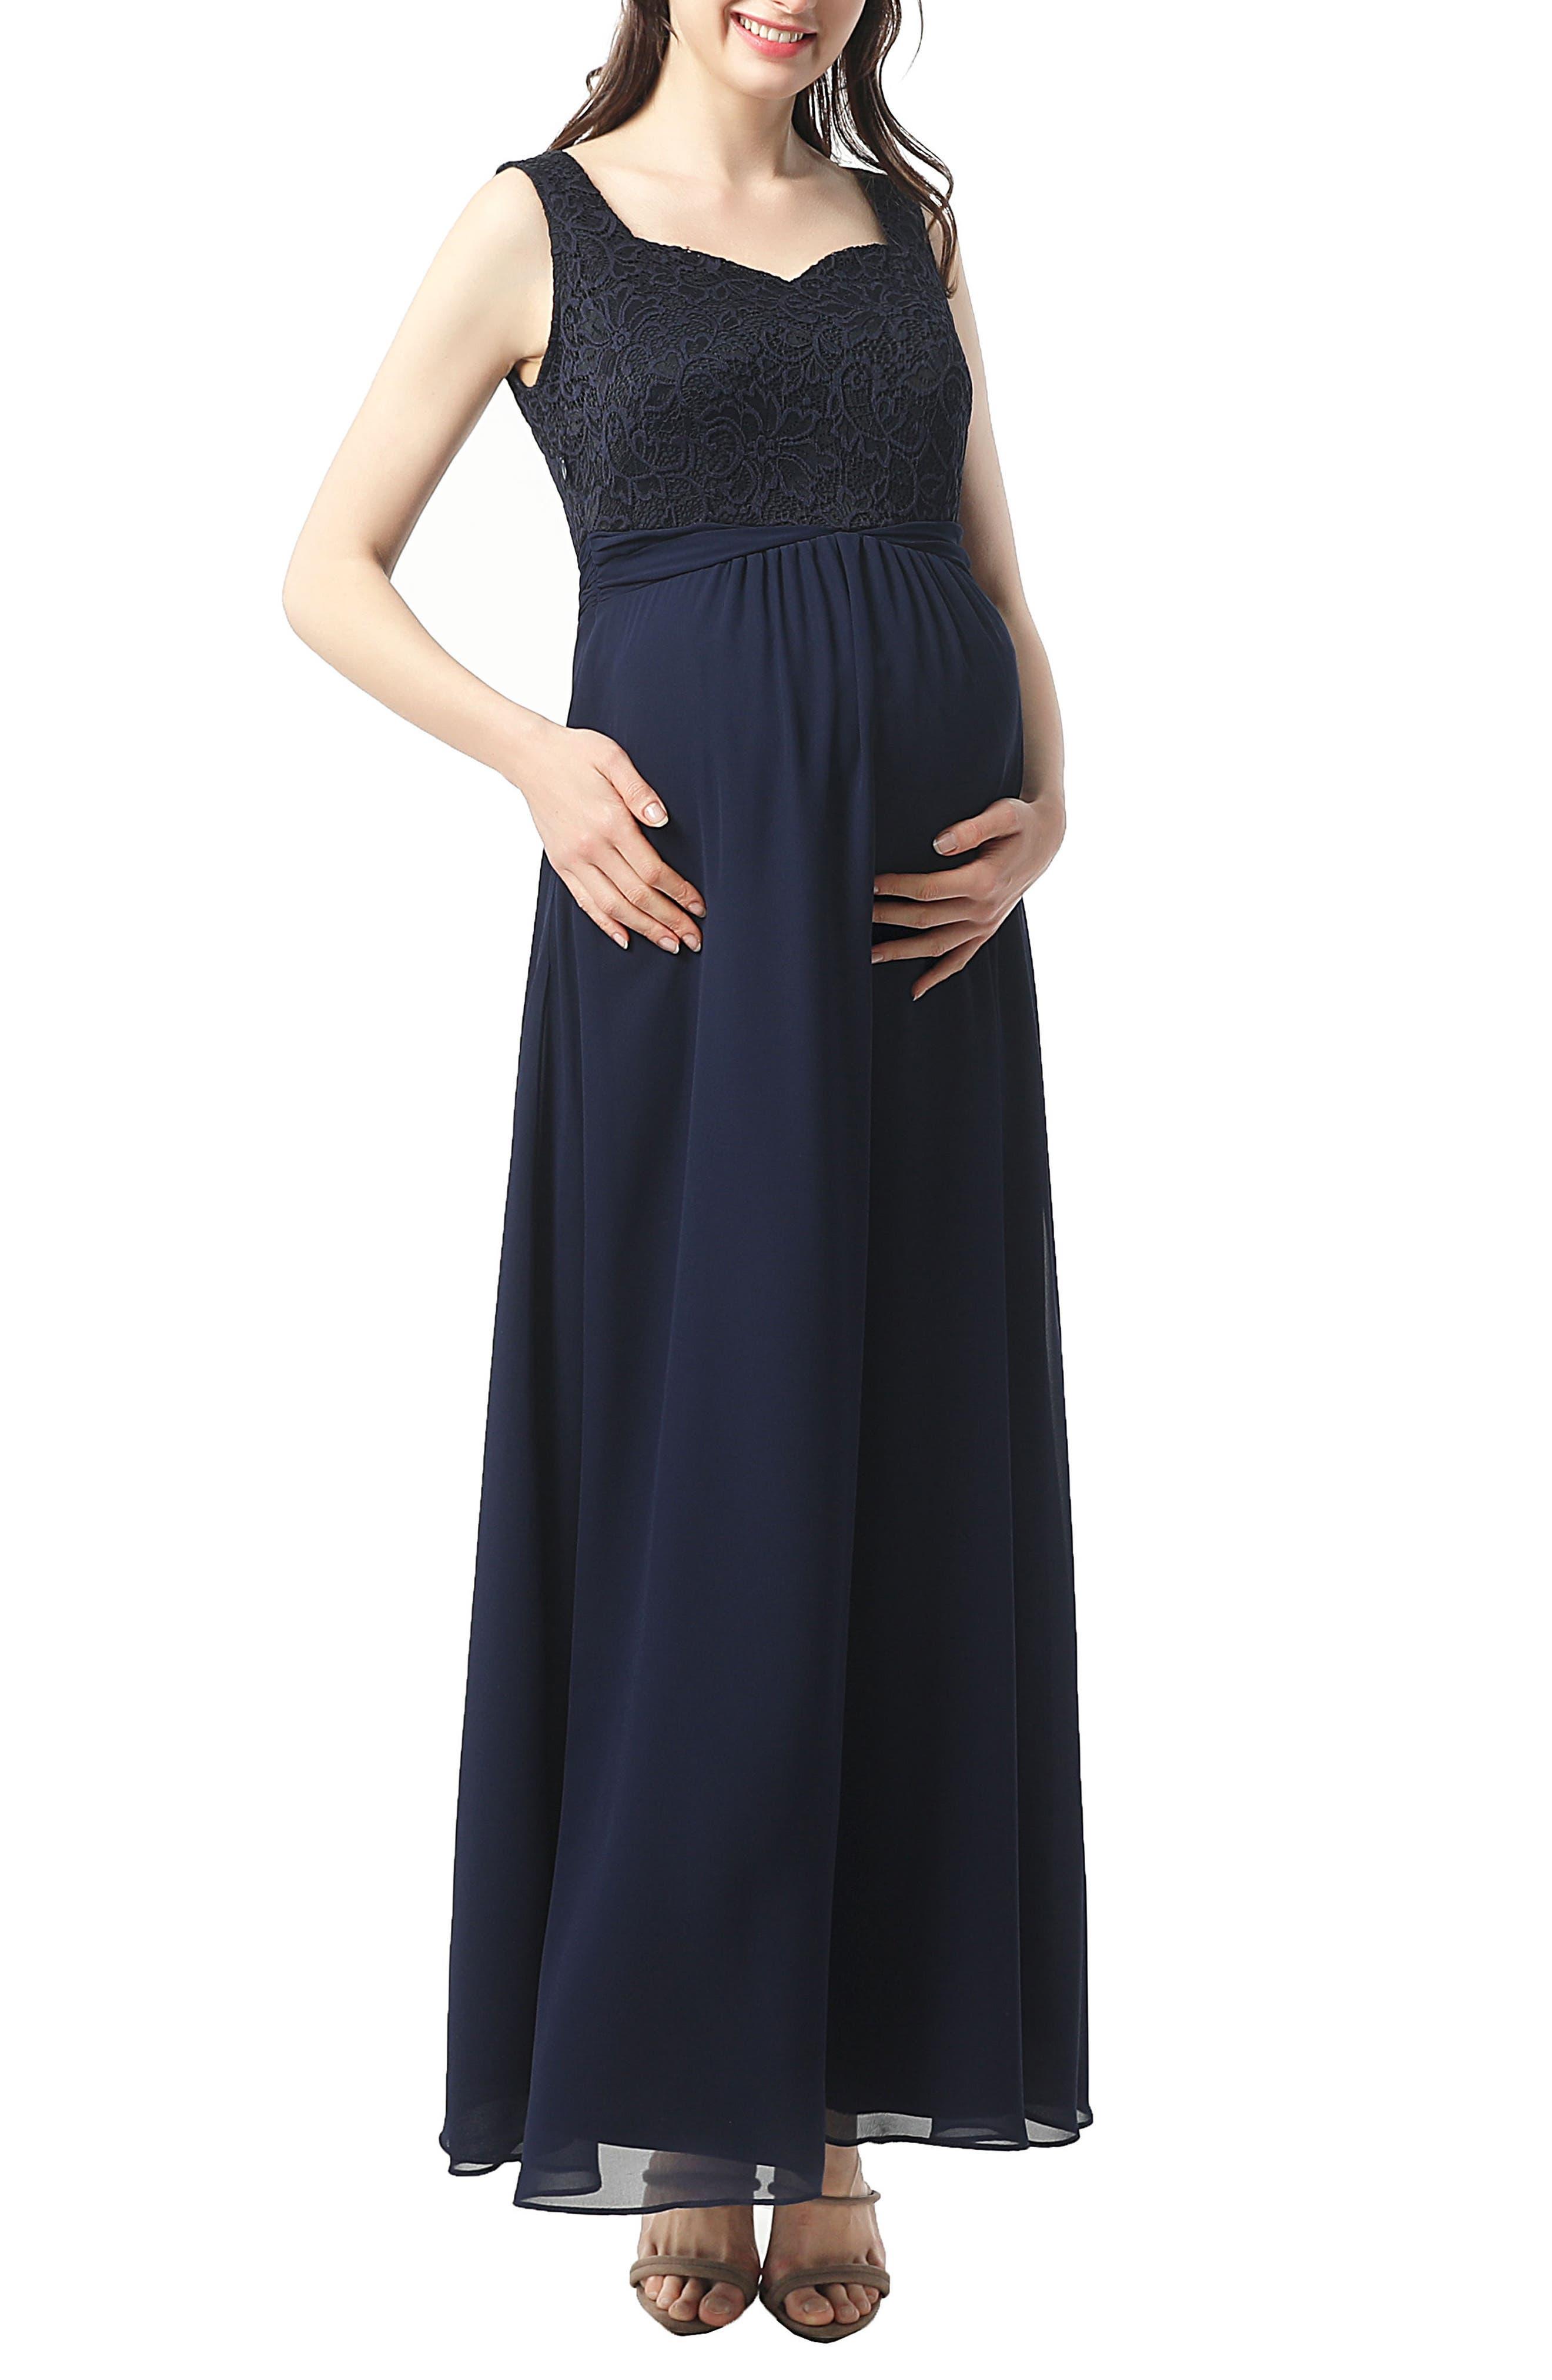 Kyra Empire Waist Maternity Gown